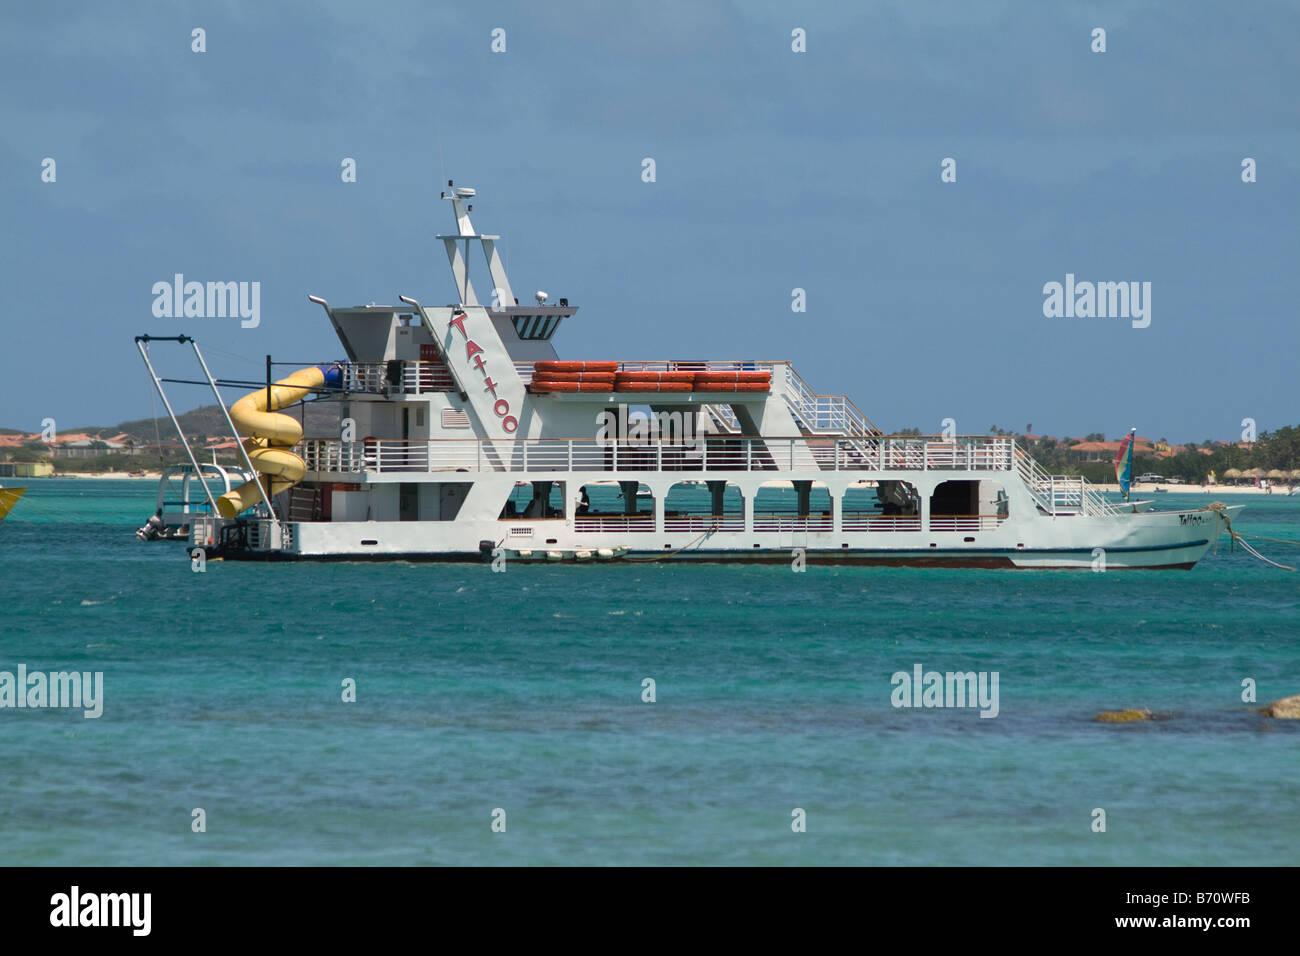 Raft Ark Stock Photos & Raft Ark Stock Images - Alamy